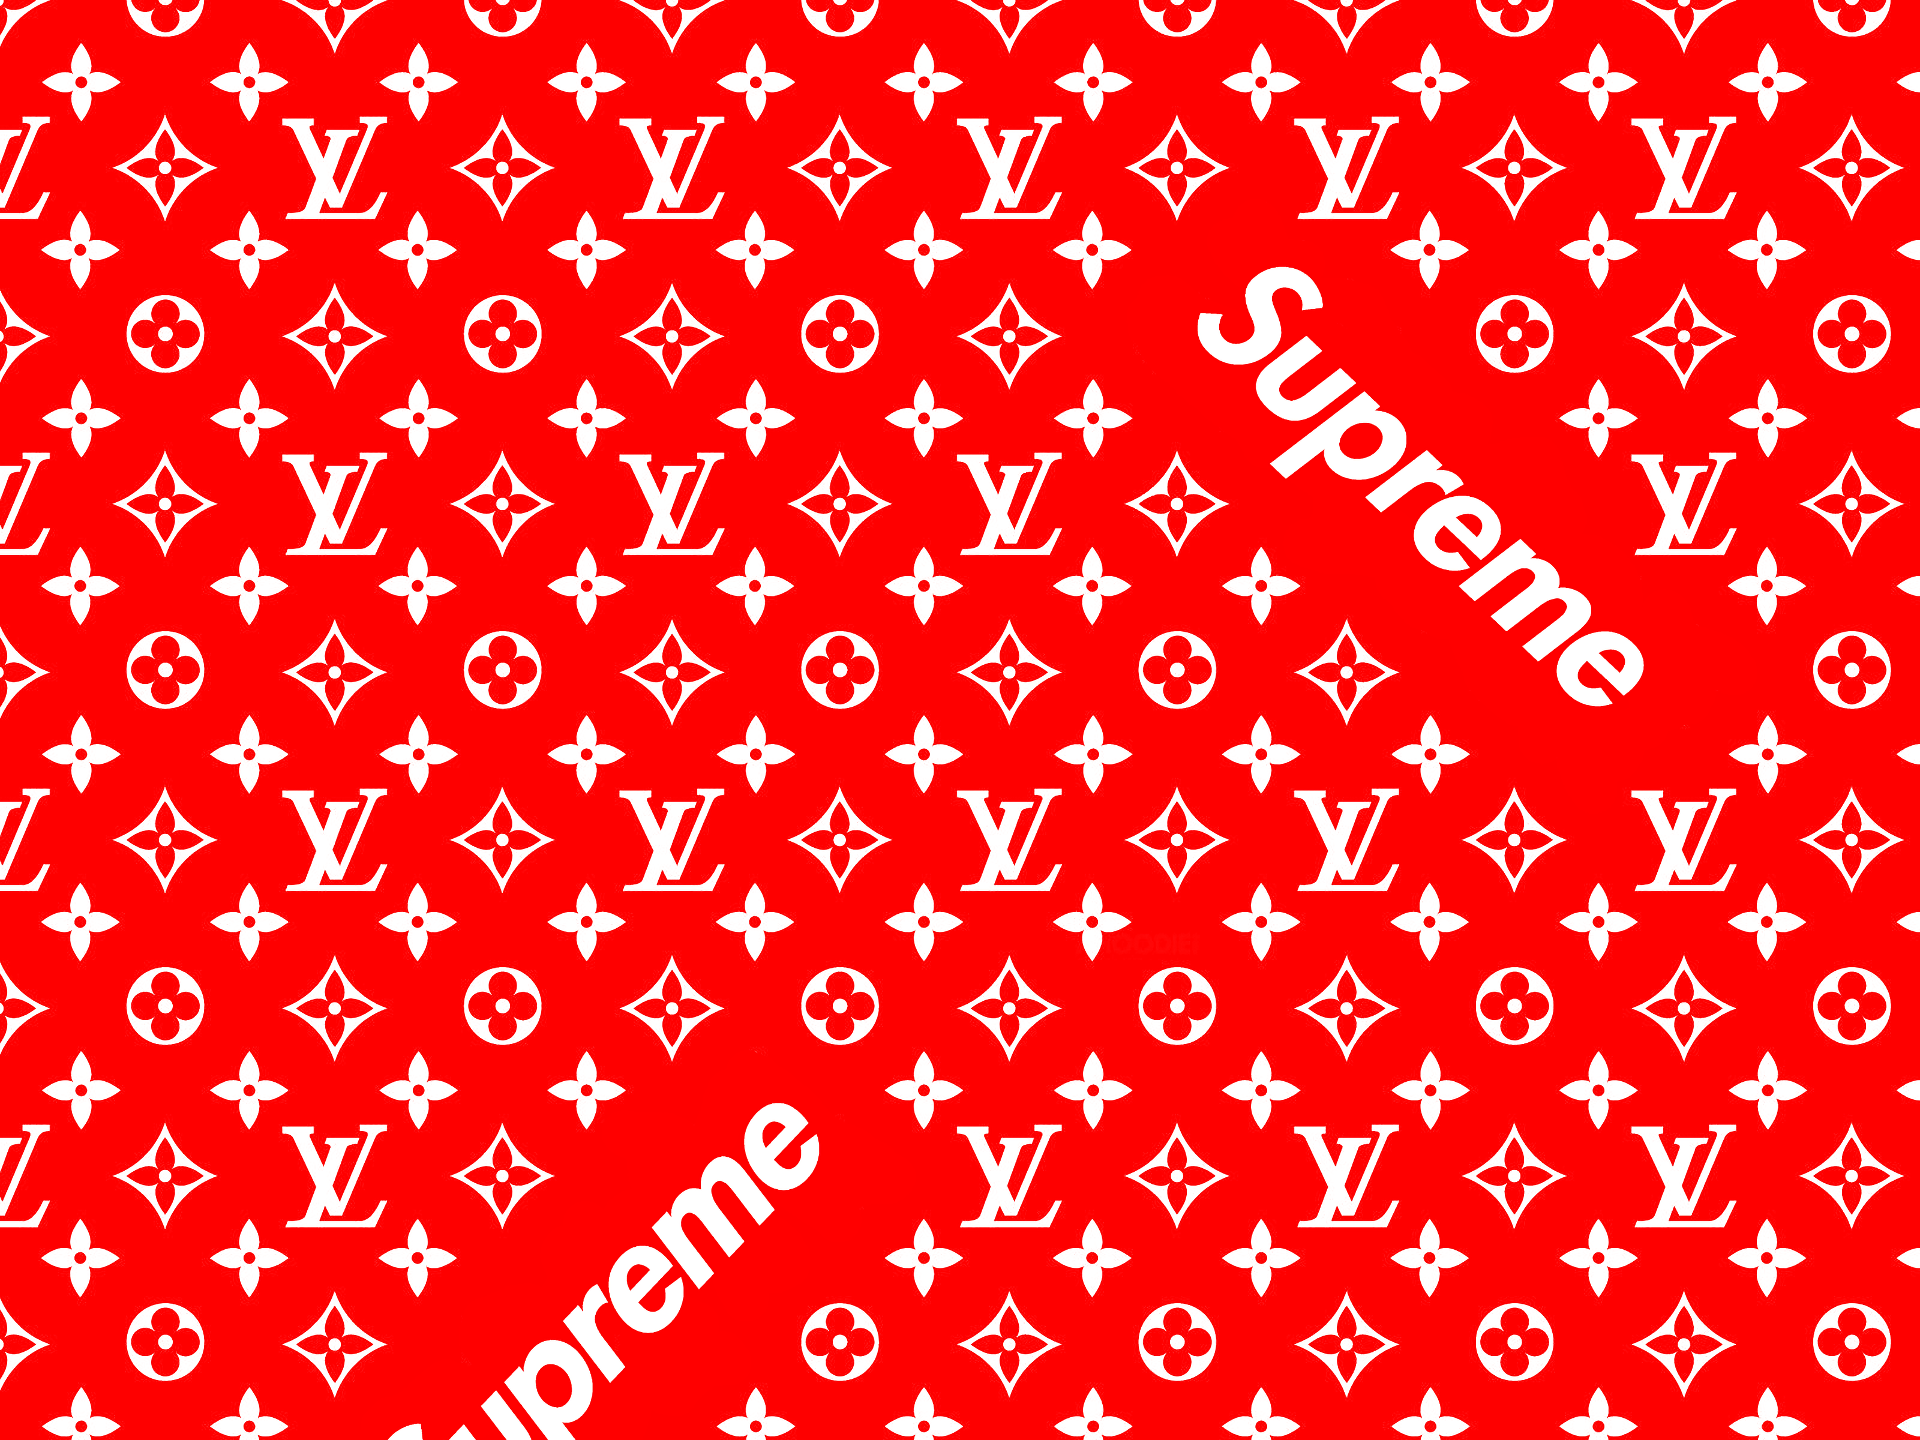 Supreme - какое значение имеет слово?